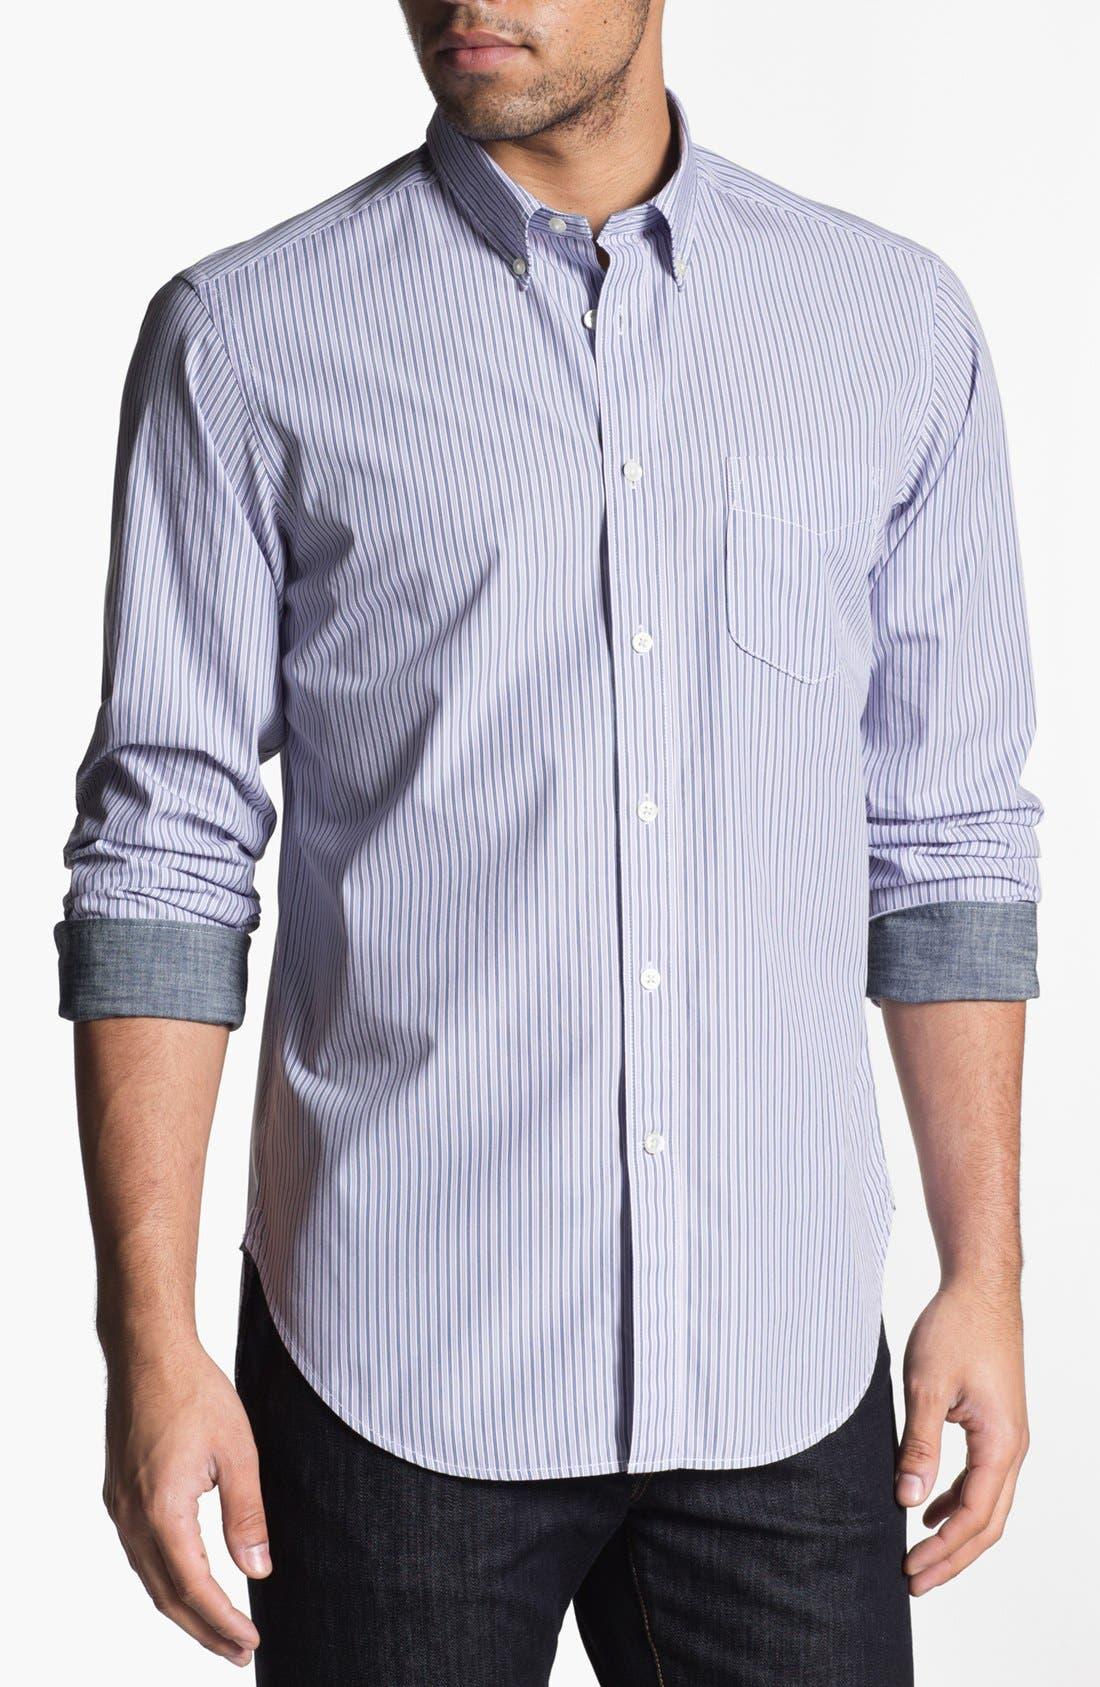 Alternate Image 1 Selected - Façonnable Tailored Denim Sport Shirt